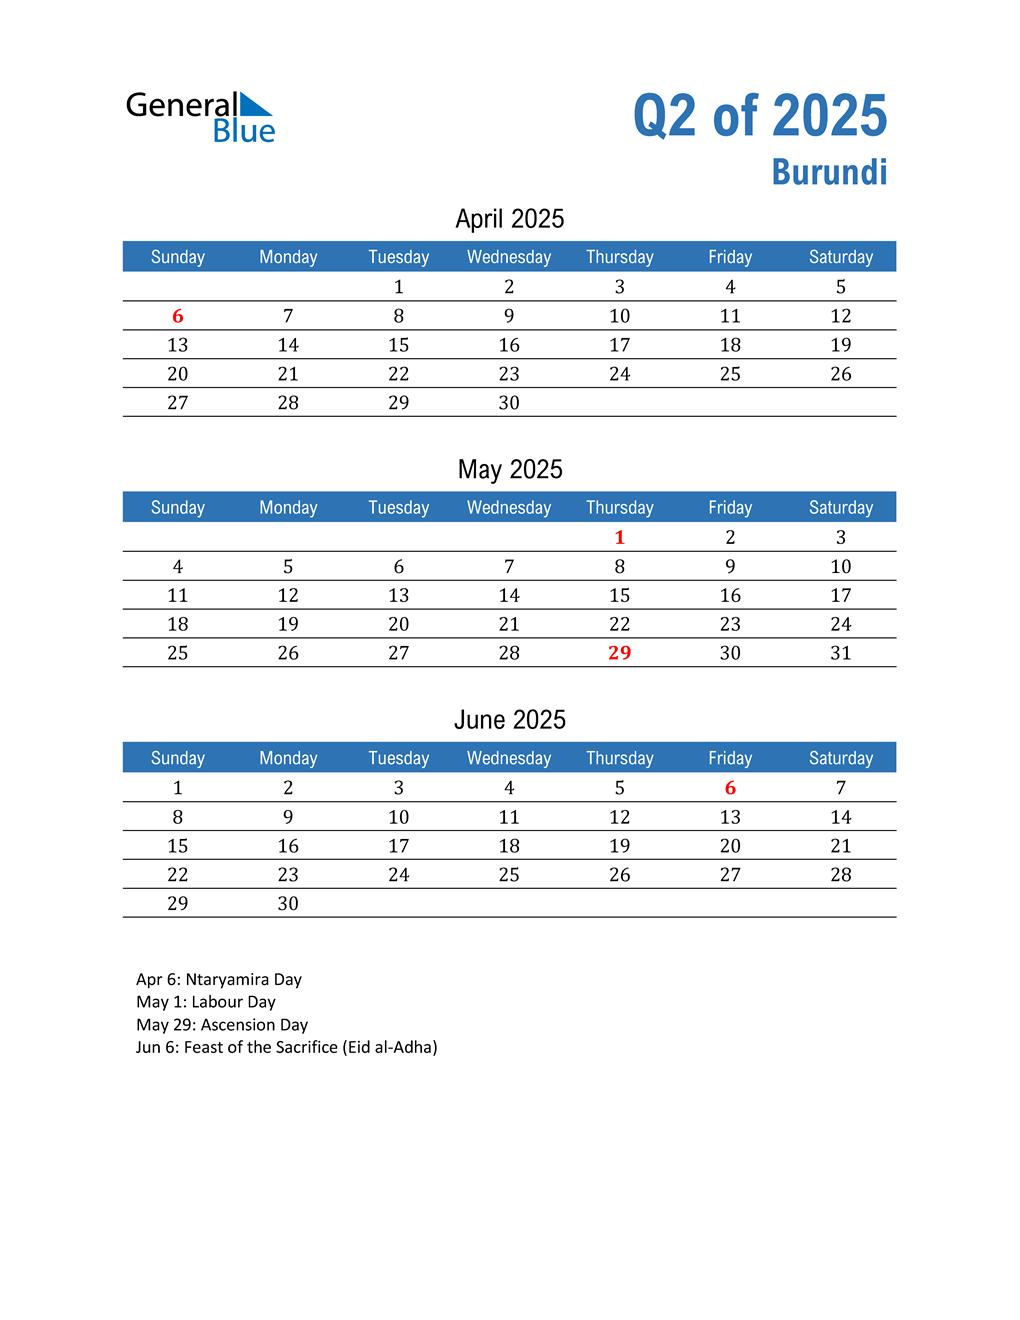 Burundi 2025 Quarterly Calendar